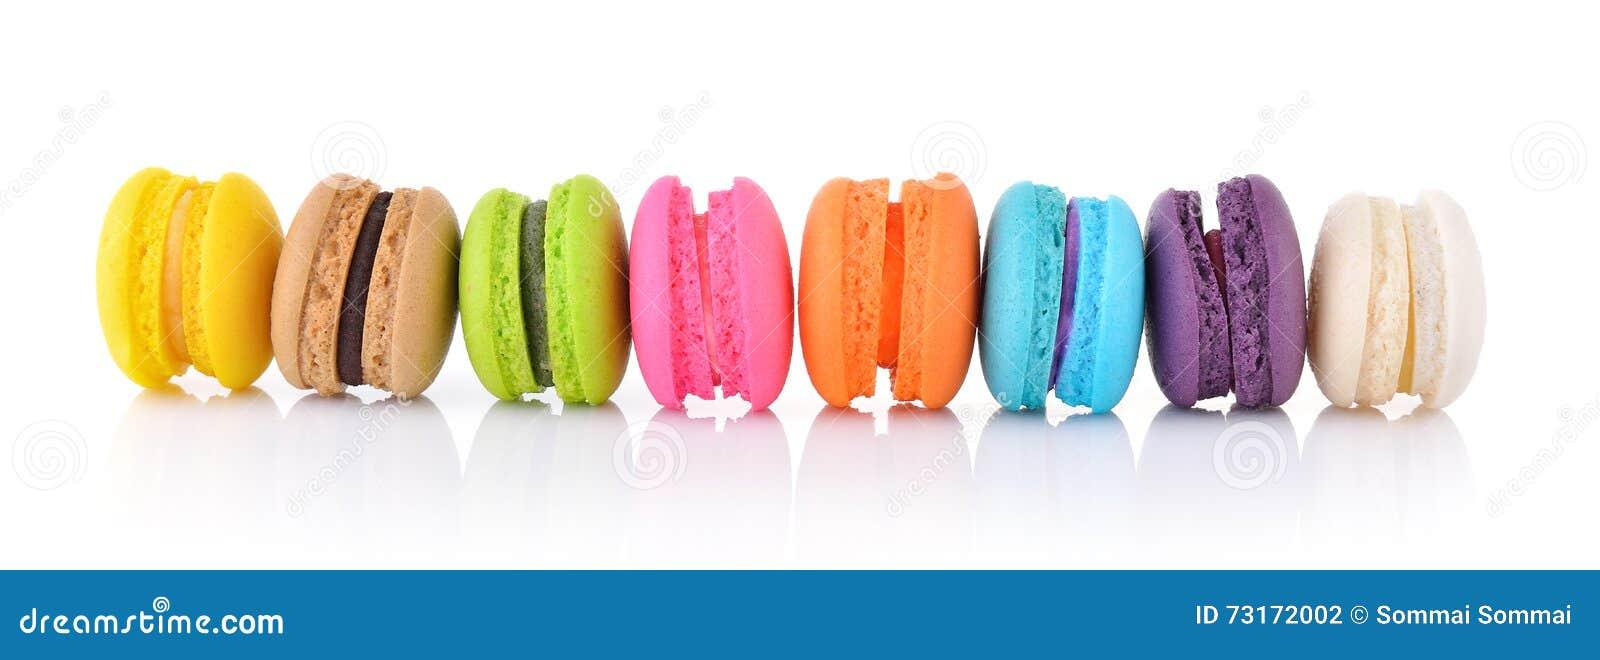 Macarrones franceses coloridos